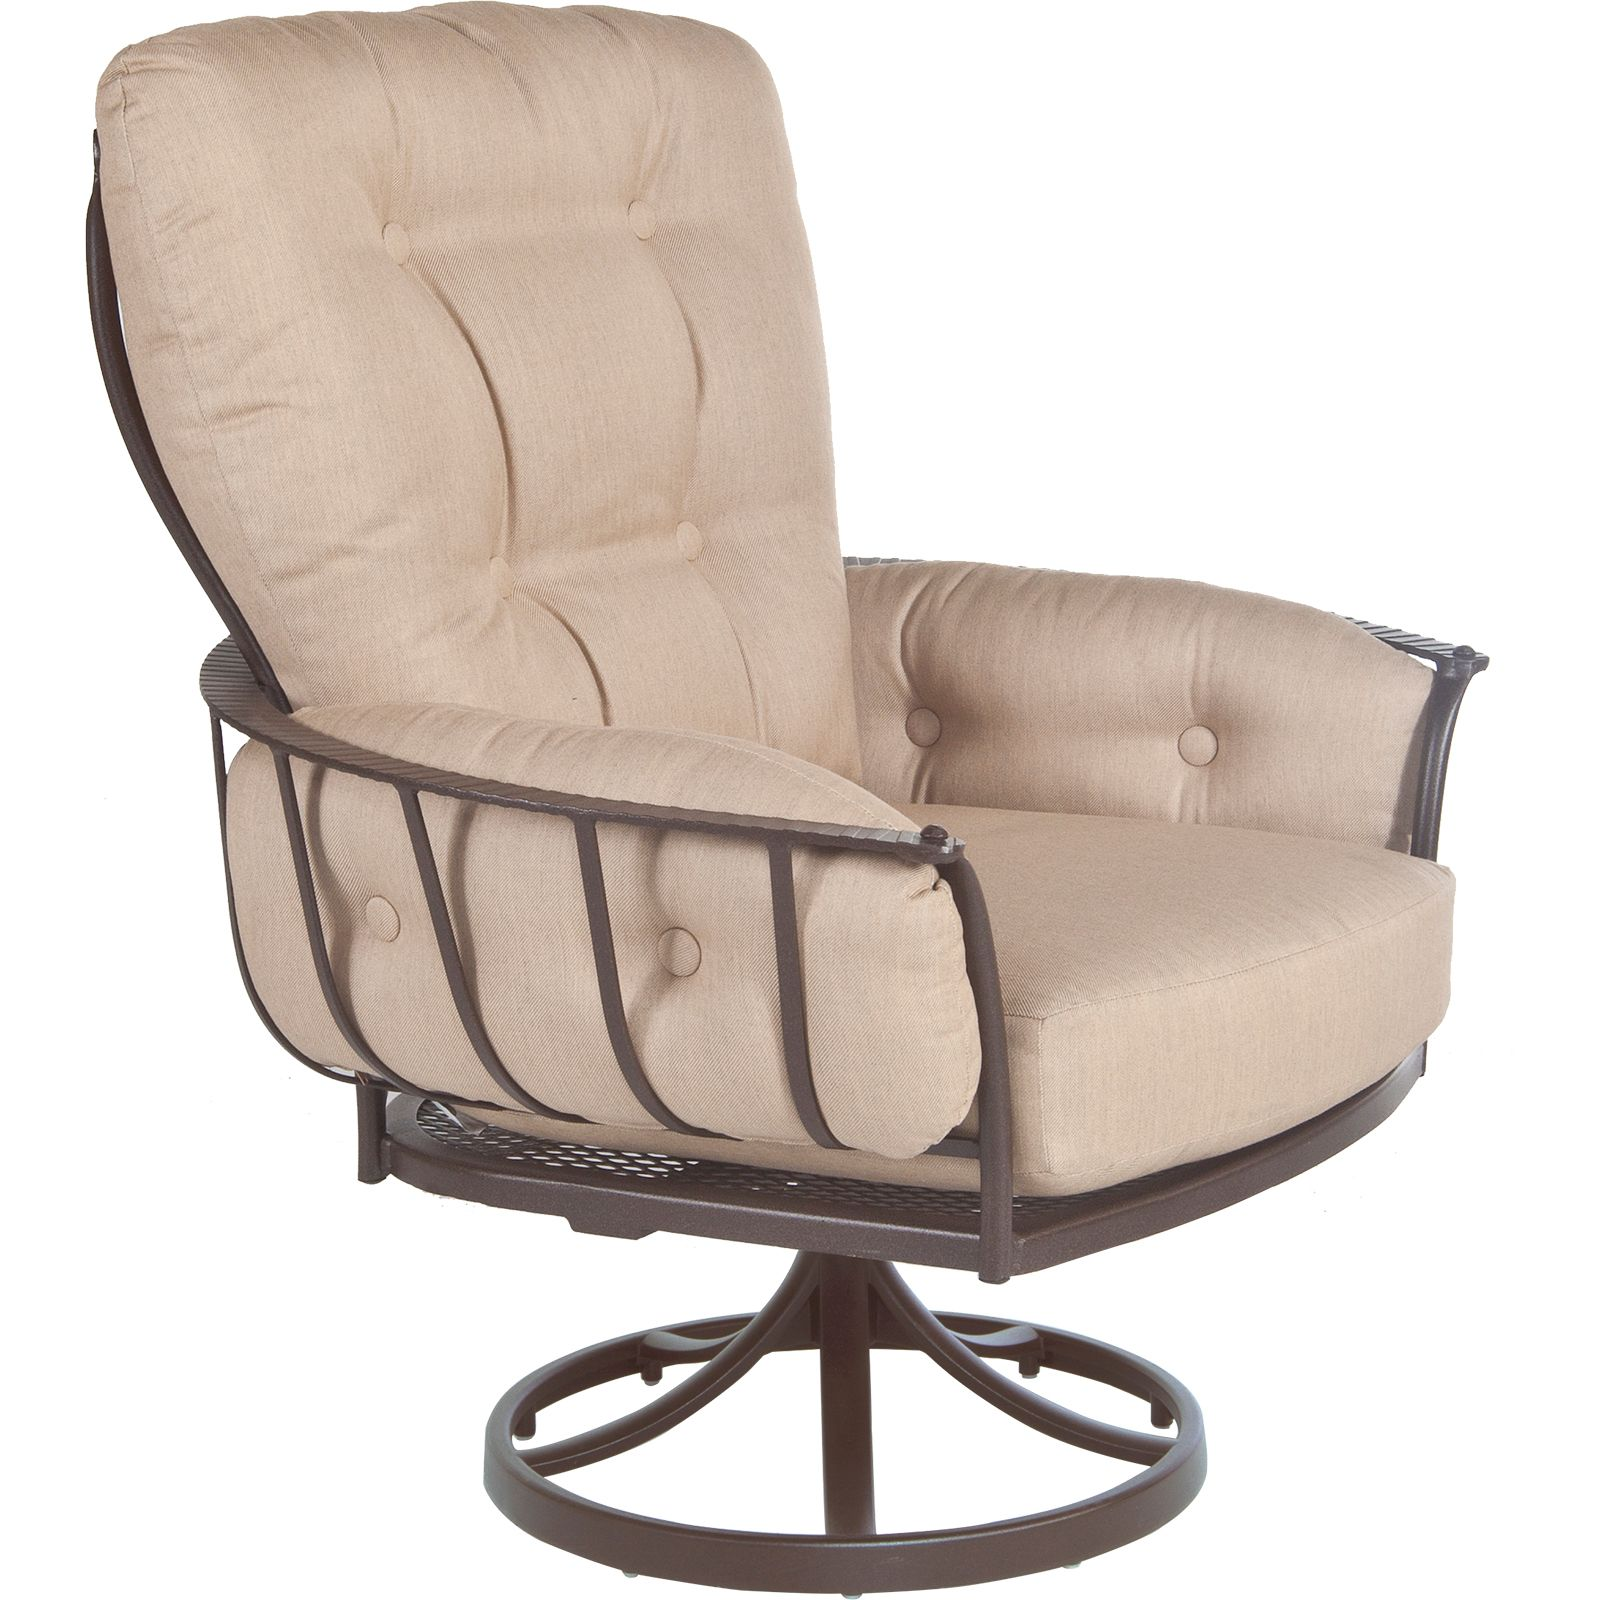 Monterra Urban-Scale Swivel Rocker Arm Chair